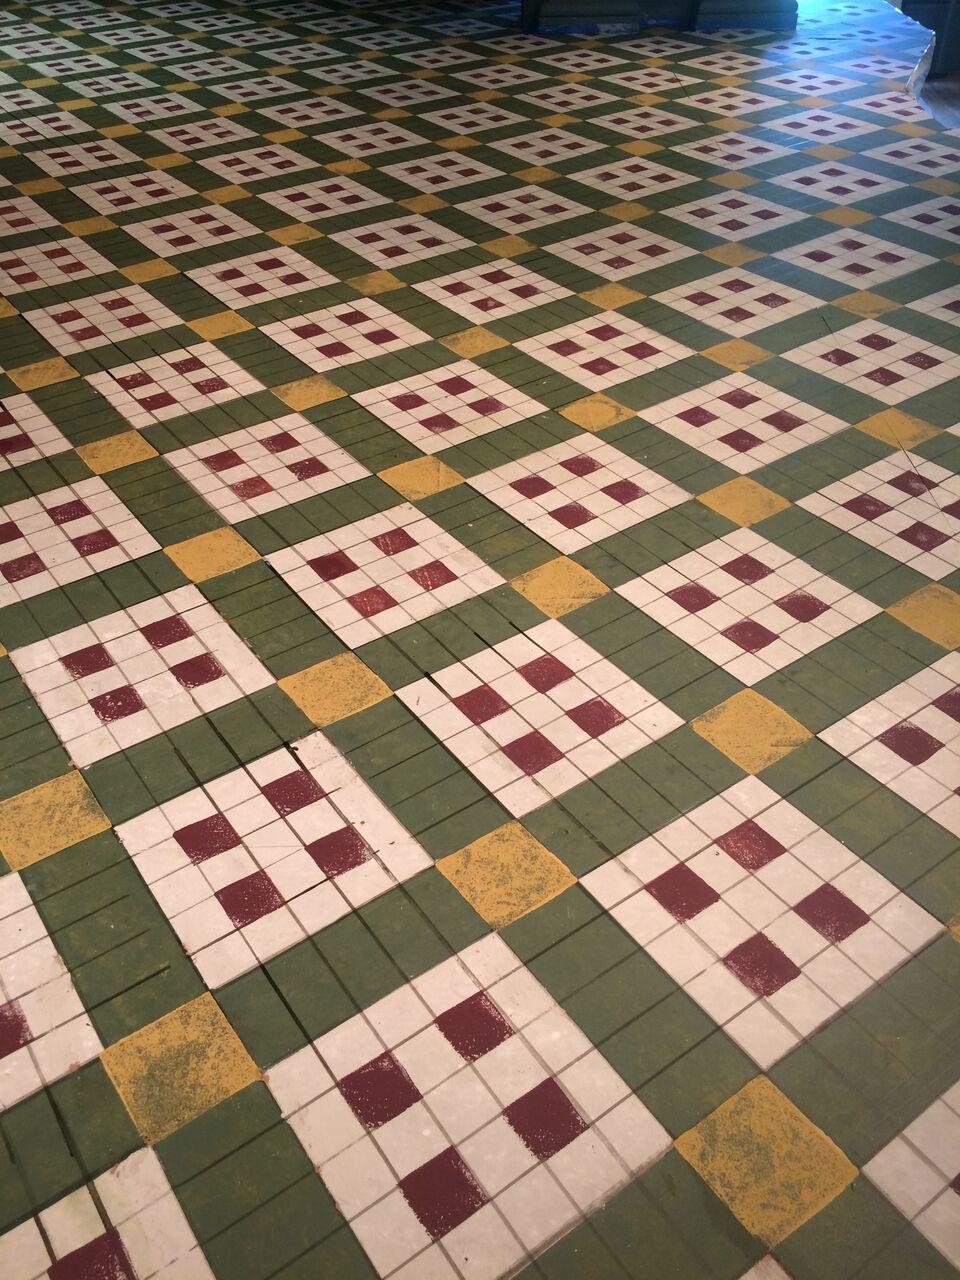 detail of in progress tile